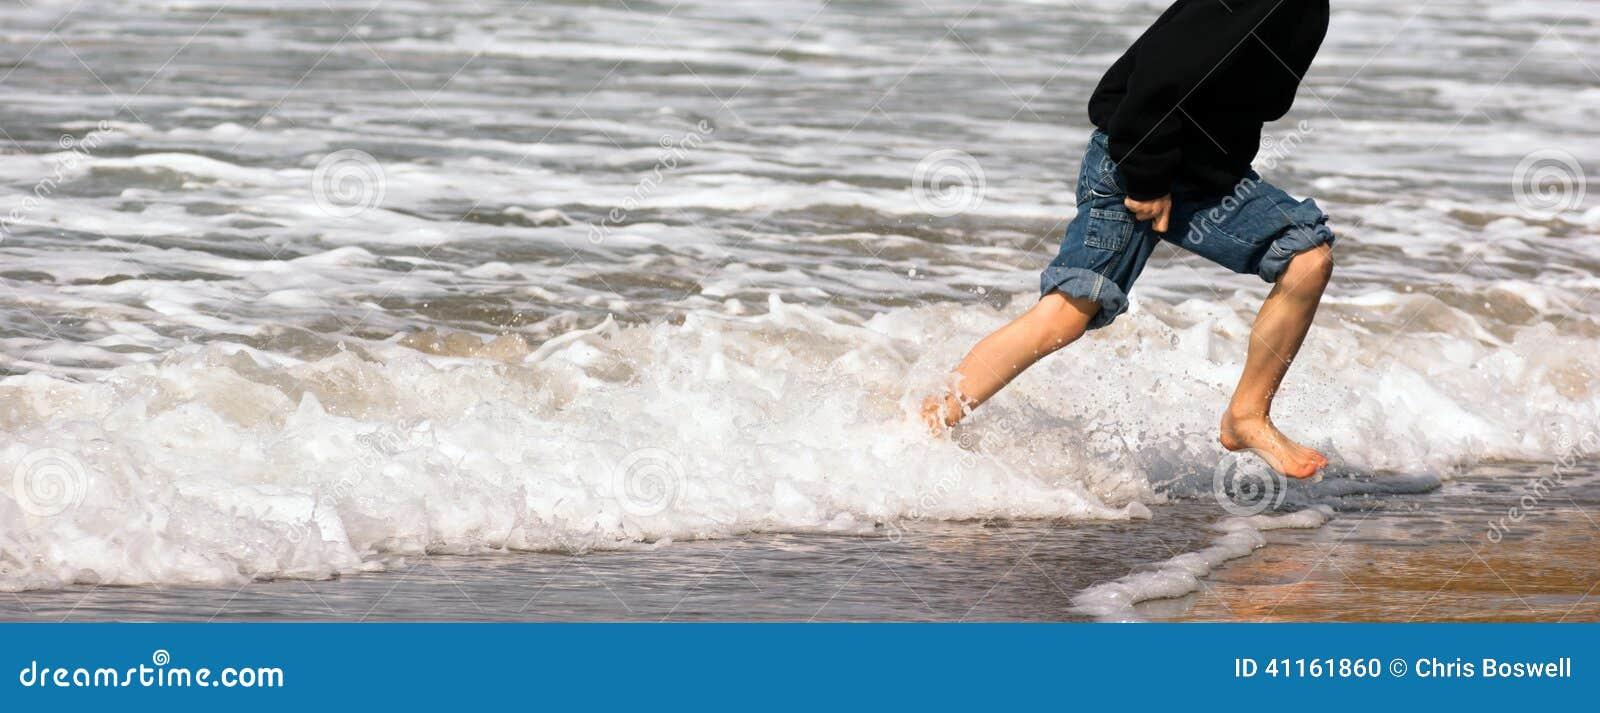 Espuma deixando de funcionar do mar da ressaca nova da praia do oceano dos pés running do menino